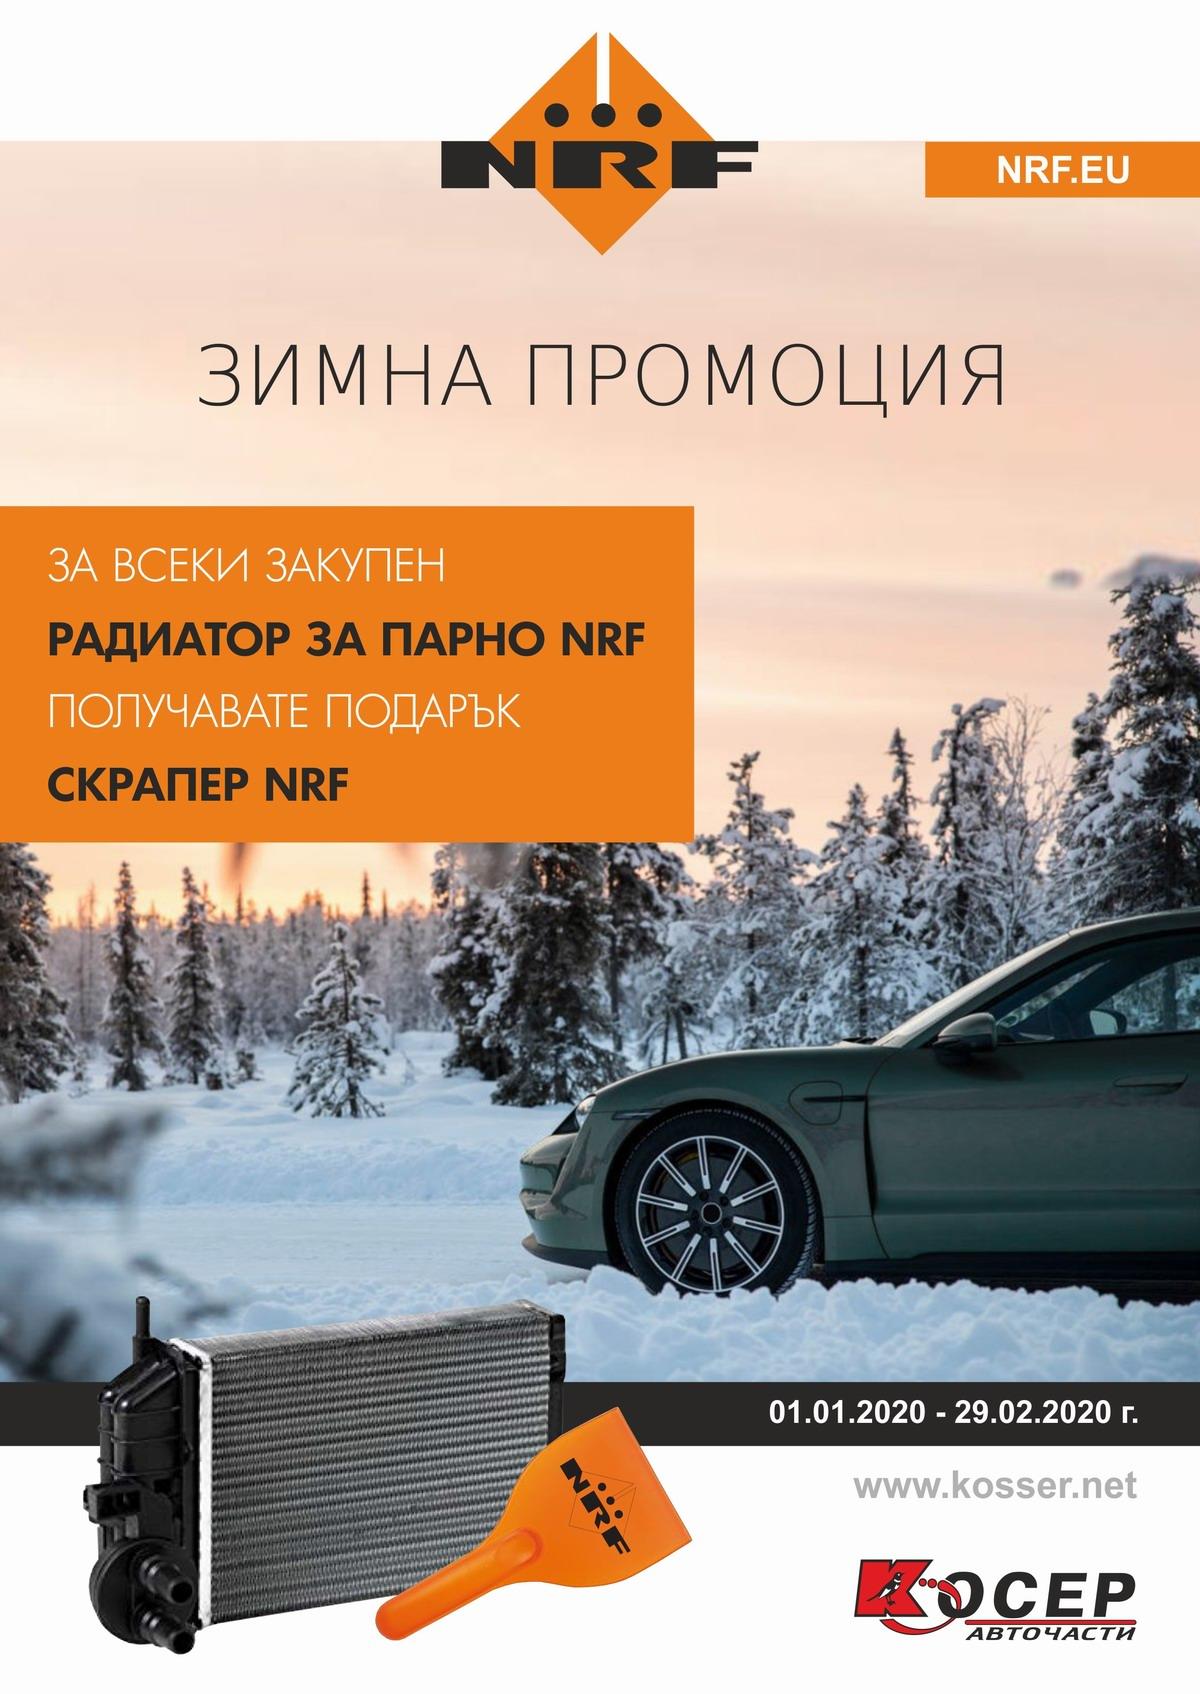 Промоция NRF - 01.01.2020 до 29.02.2020